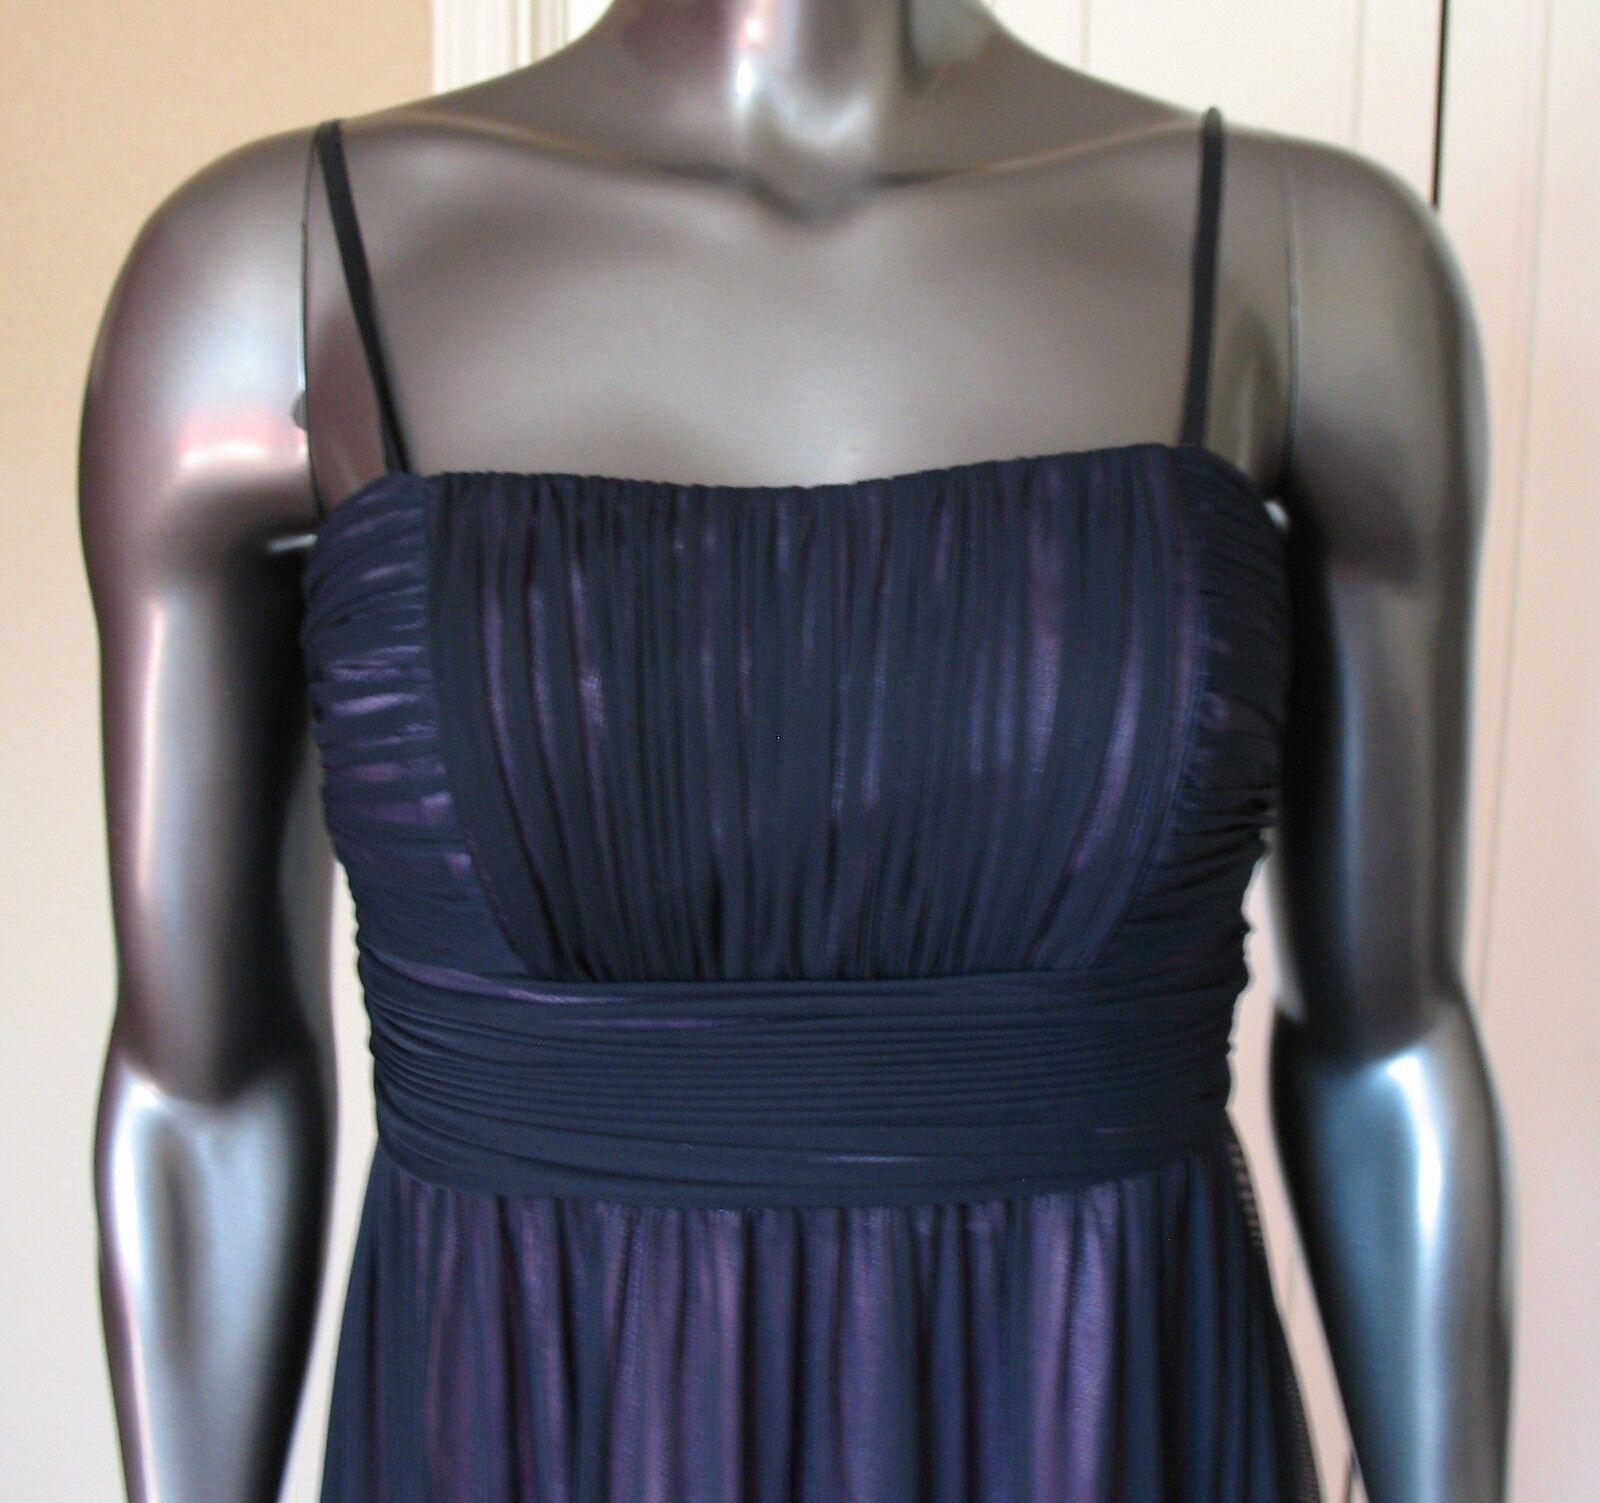 OLEG CASSINI DAVID'S BRIDAL NAVY purpleC purpleC purpleC SPAGHETTI STRAP  BRA DRESS SIZE 4 406ec3